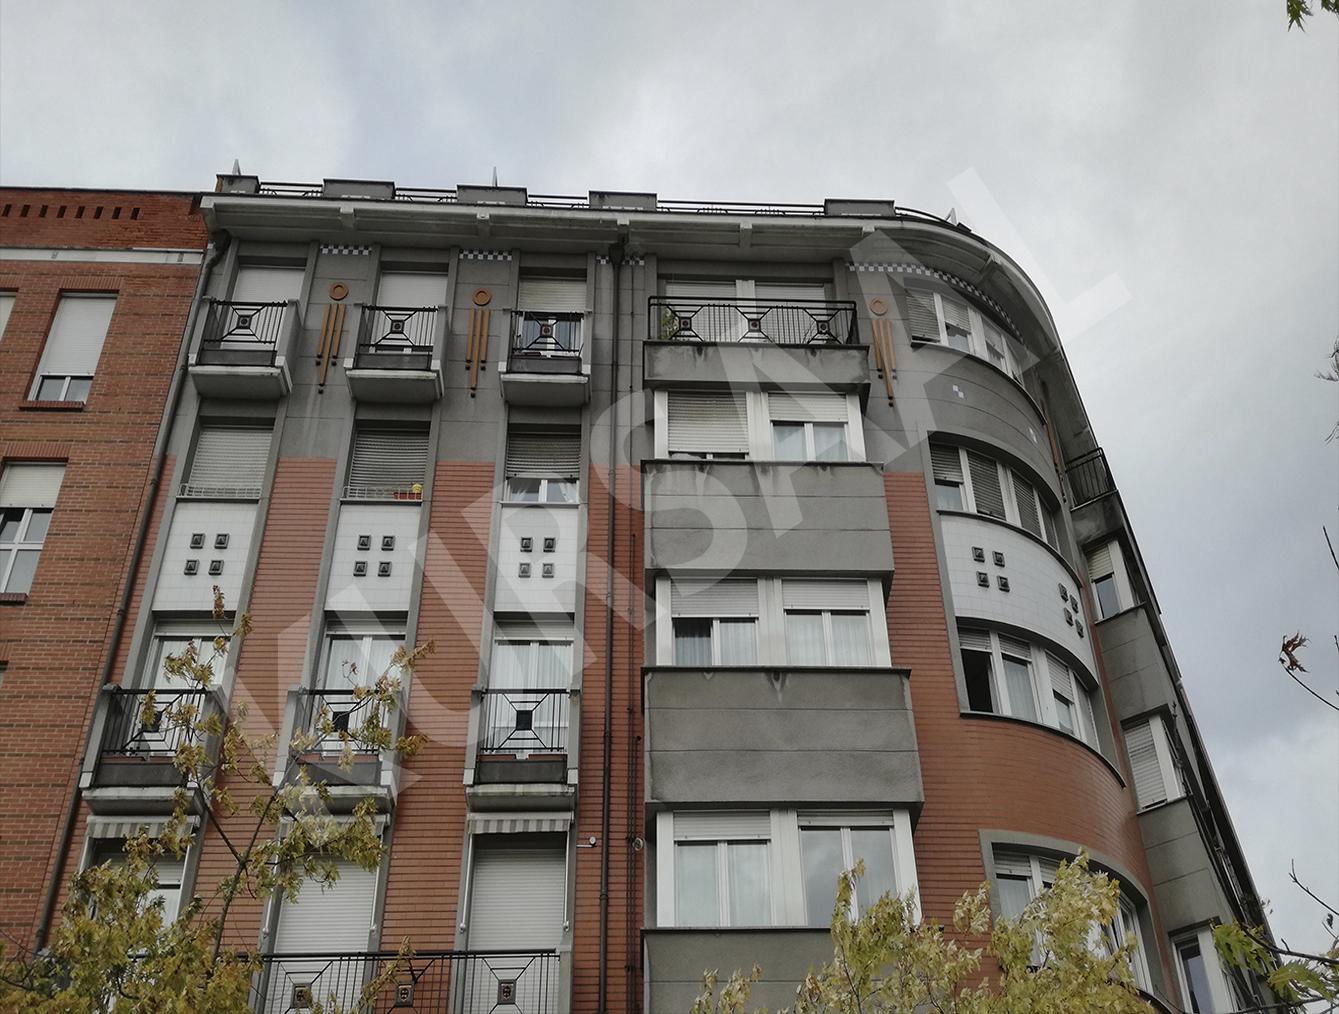 foto 3 - Restauración y patrimonio-Marcelino Soroa 5-DONOSTIA, GIPUZKOA